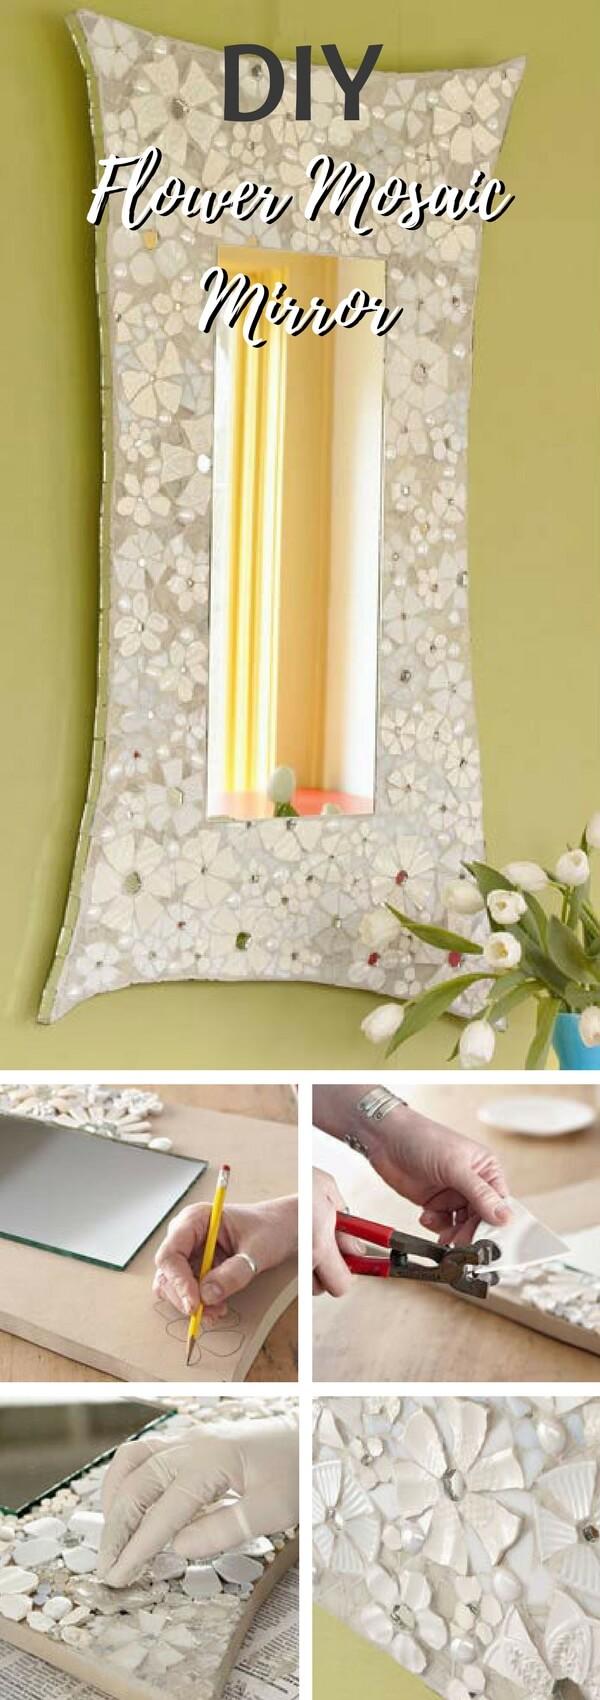 Create an Intricate Flower Mosaic Mirror